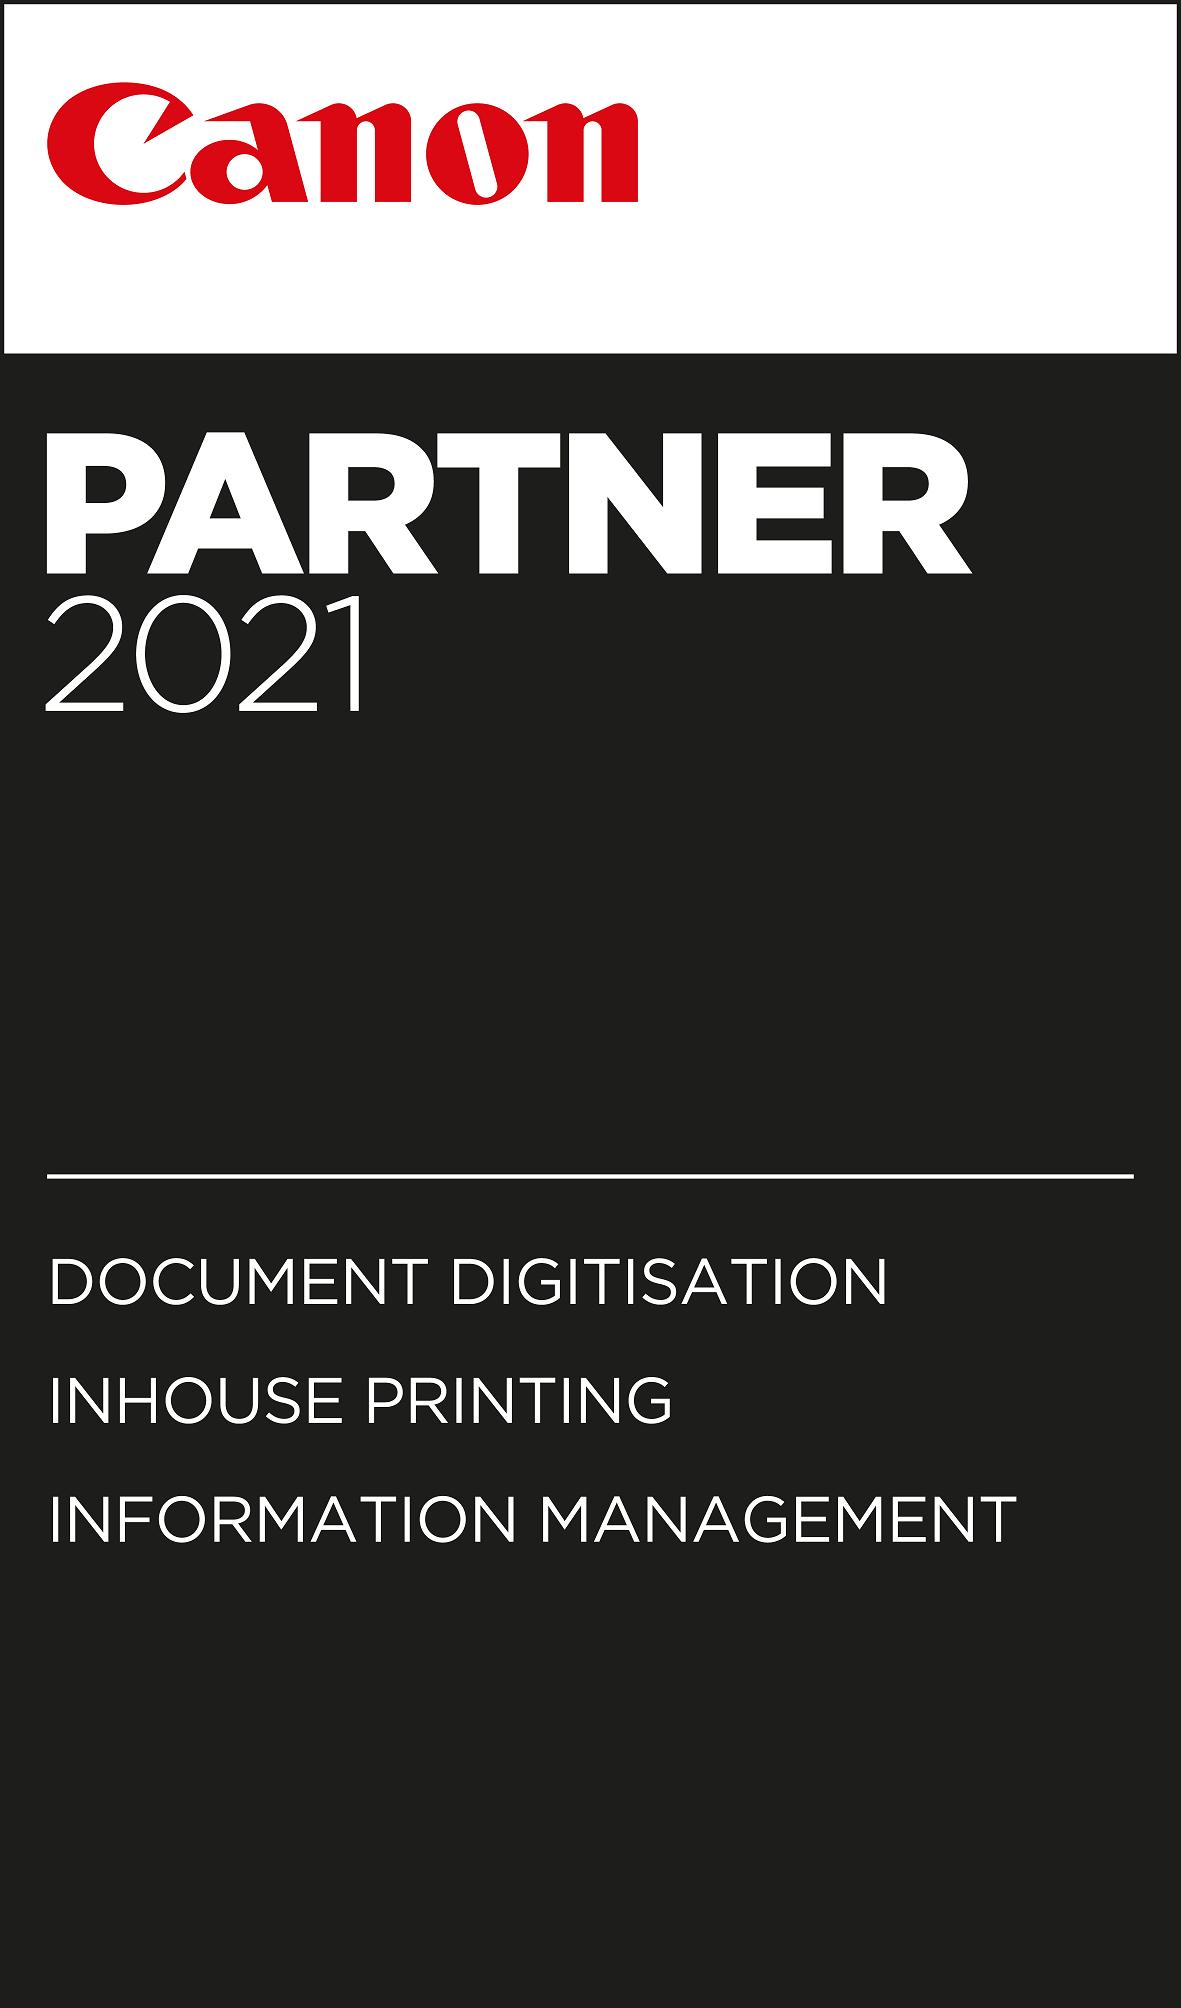 Canon Partner 2021